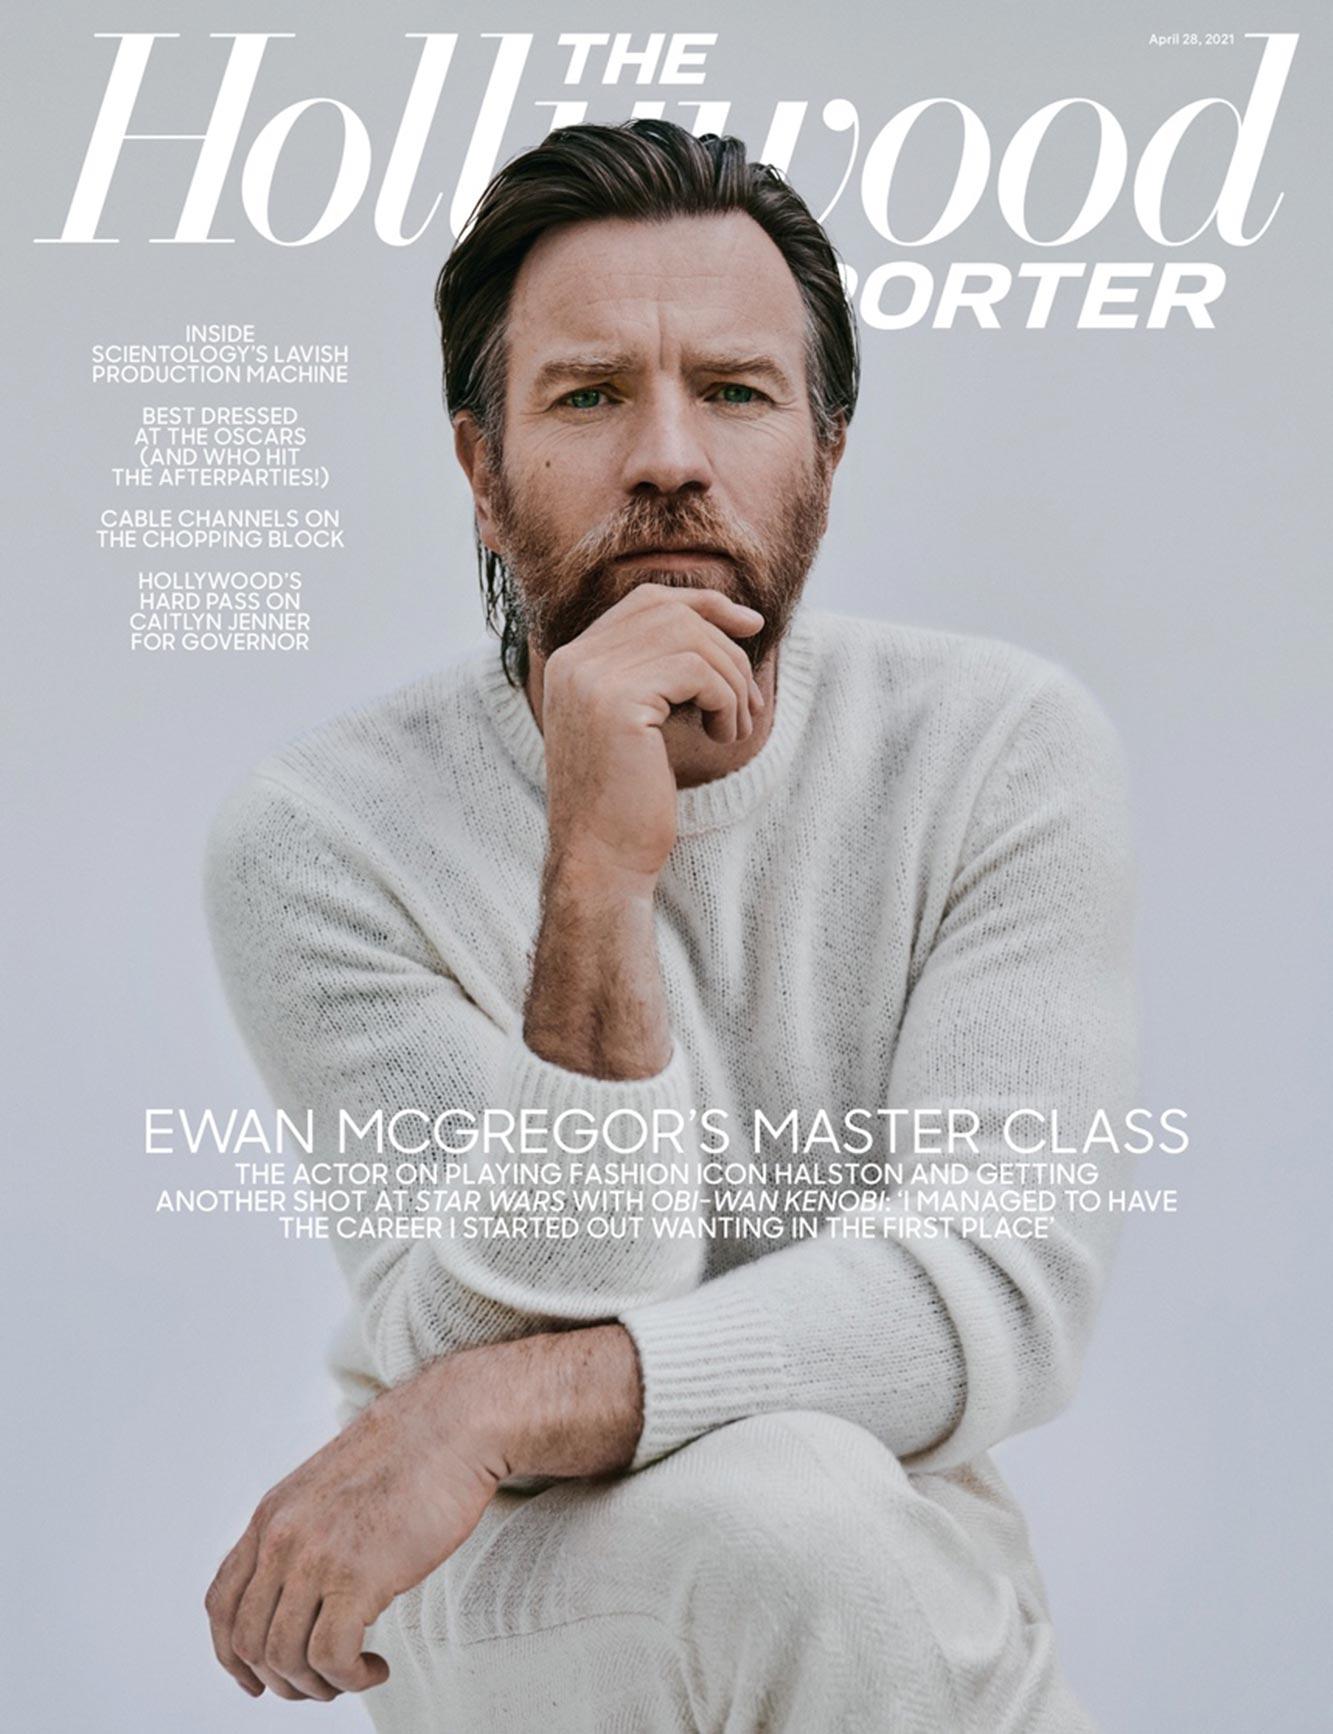 The Hollywood Reporter - Ewan McGregor